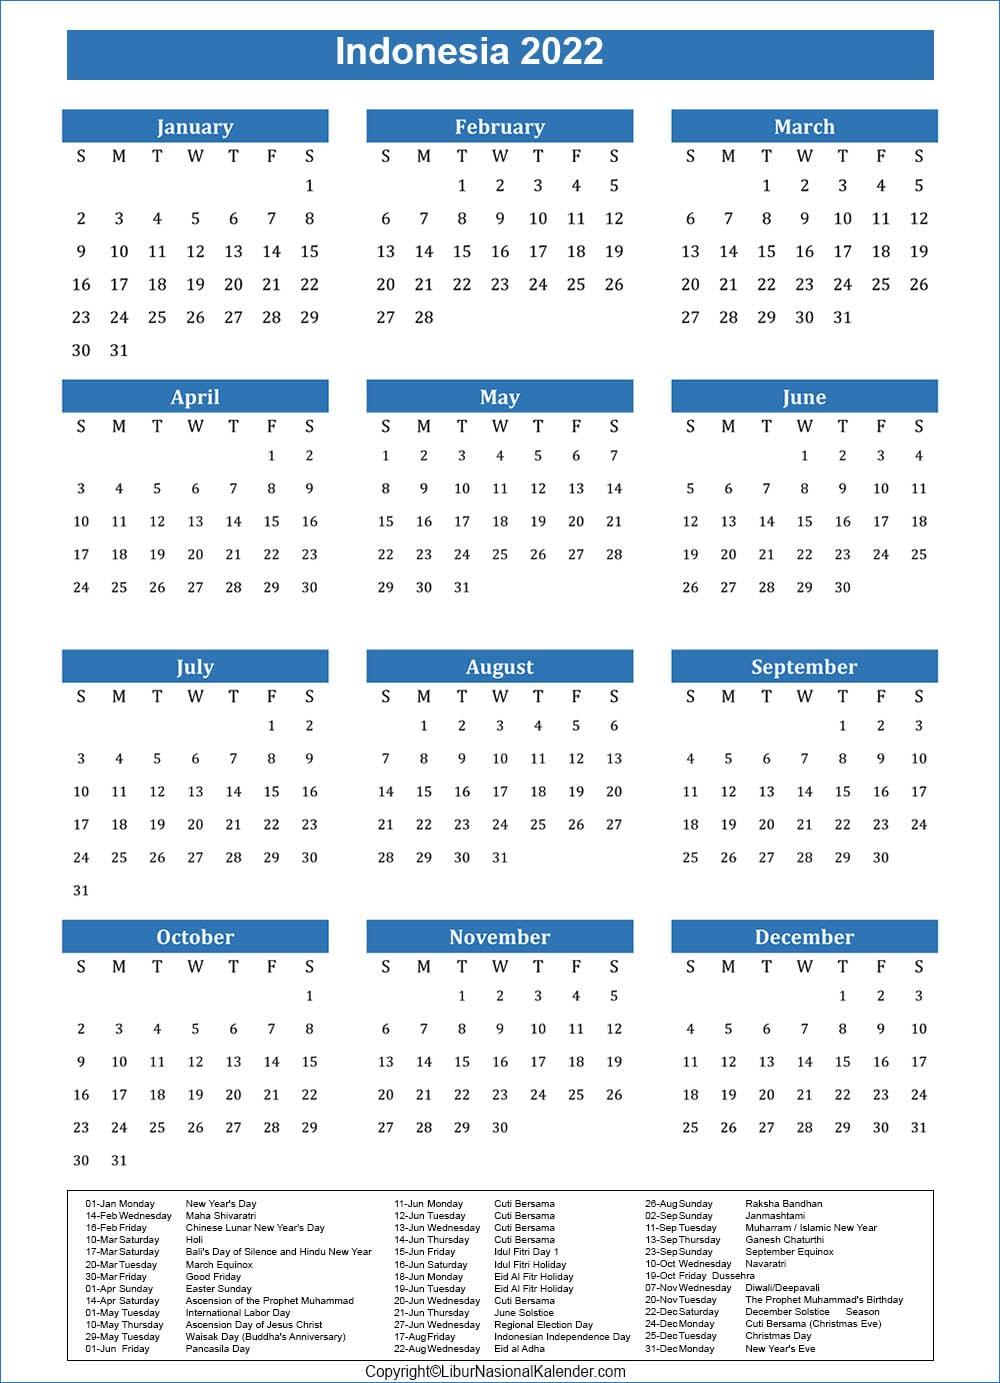 Indonesia Calendar 2022